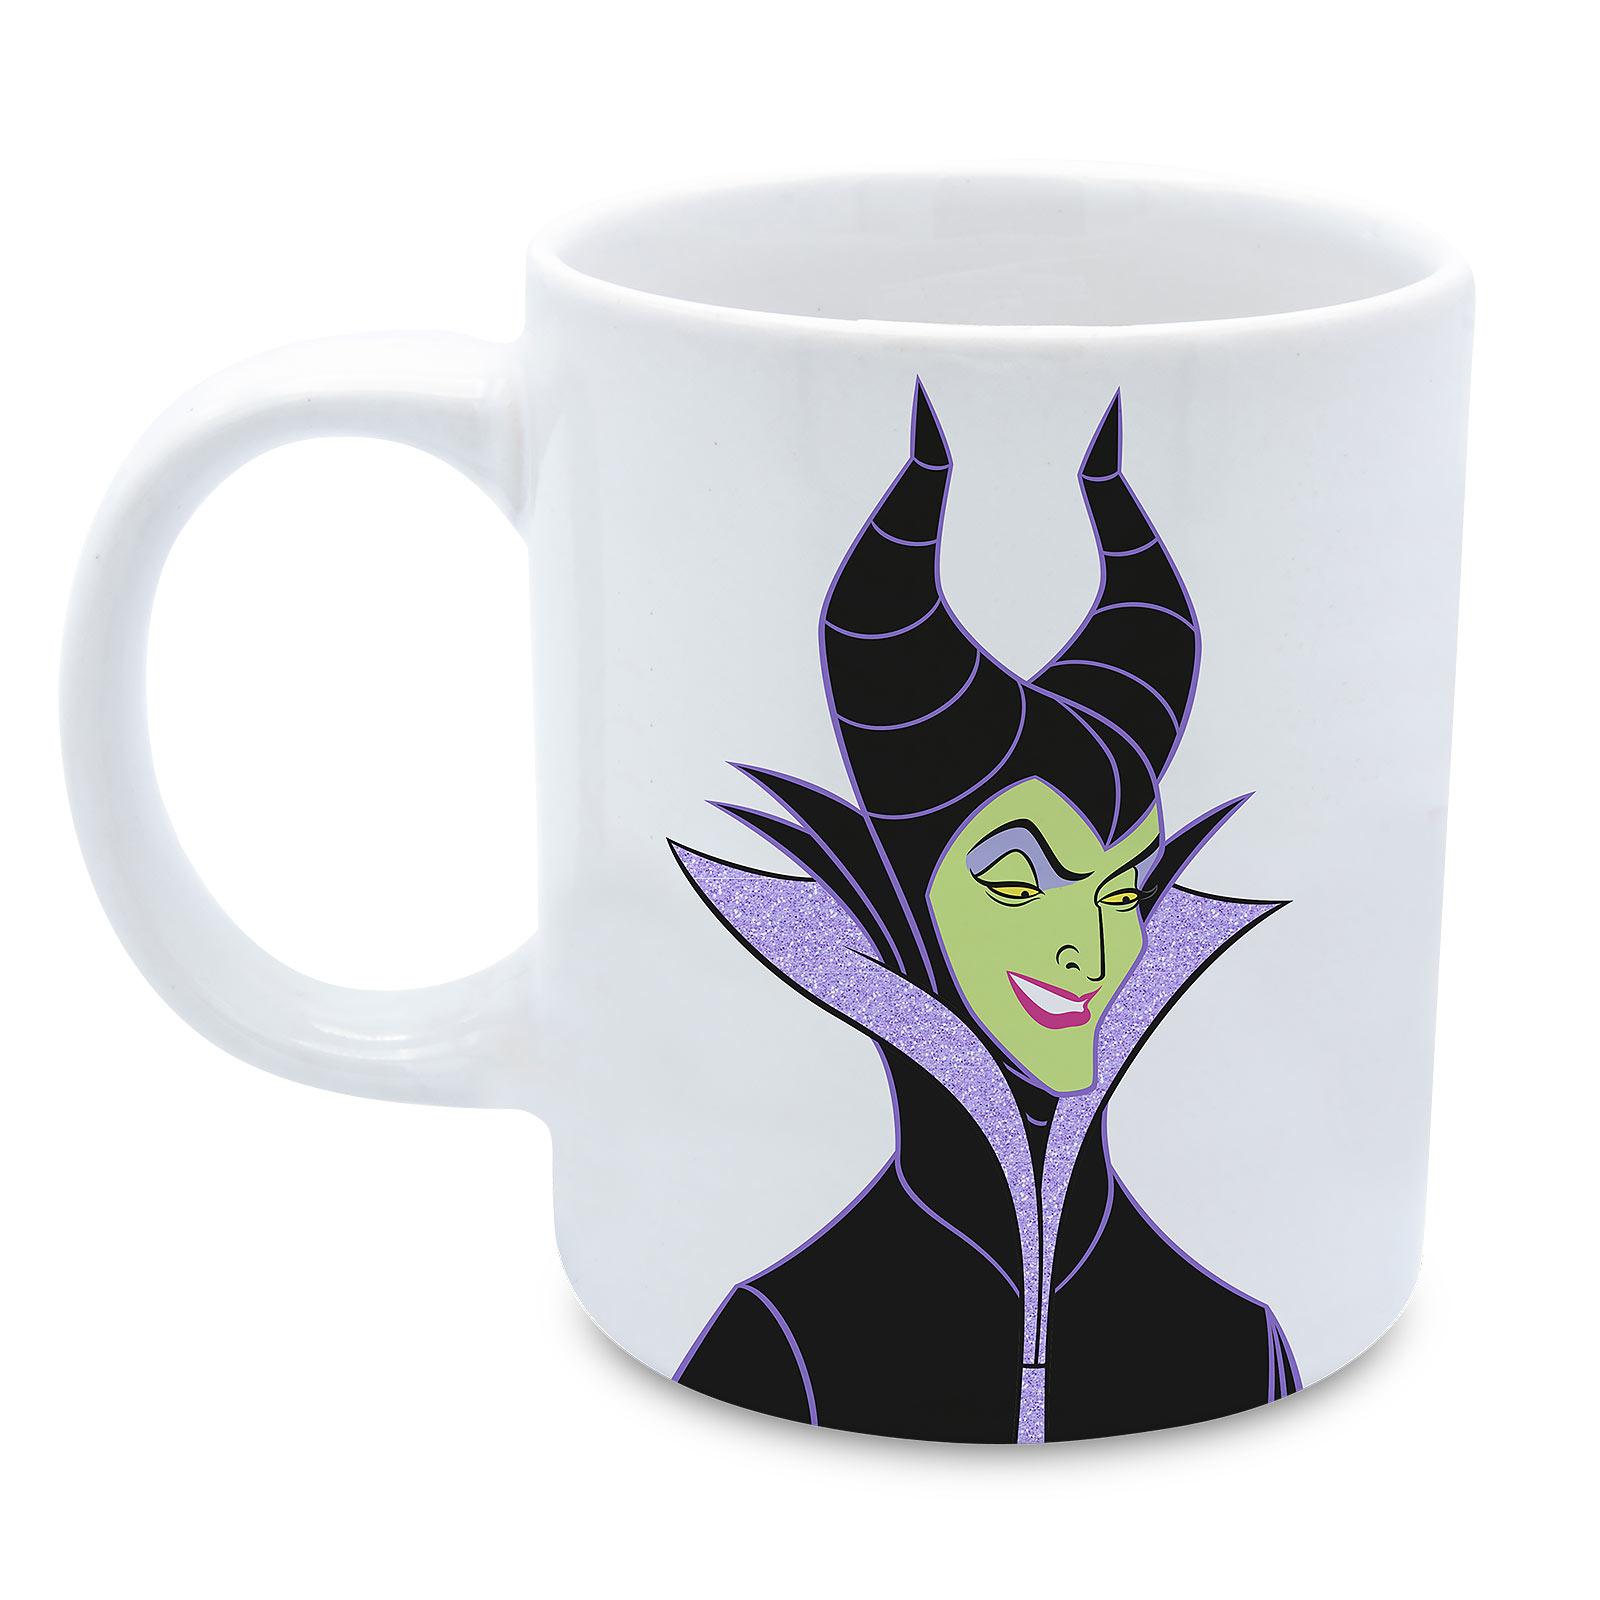 Disney - Maleficent Evil Tasse mit Glitzer